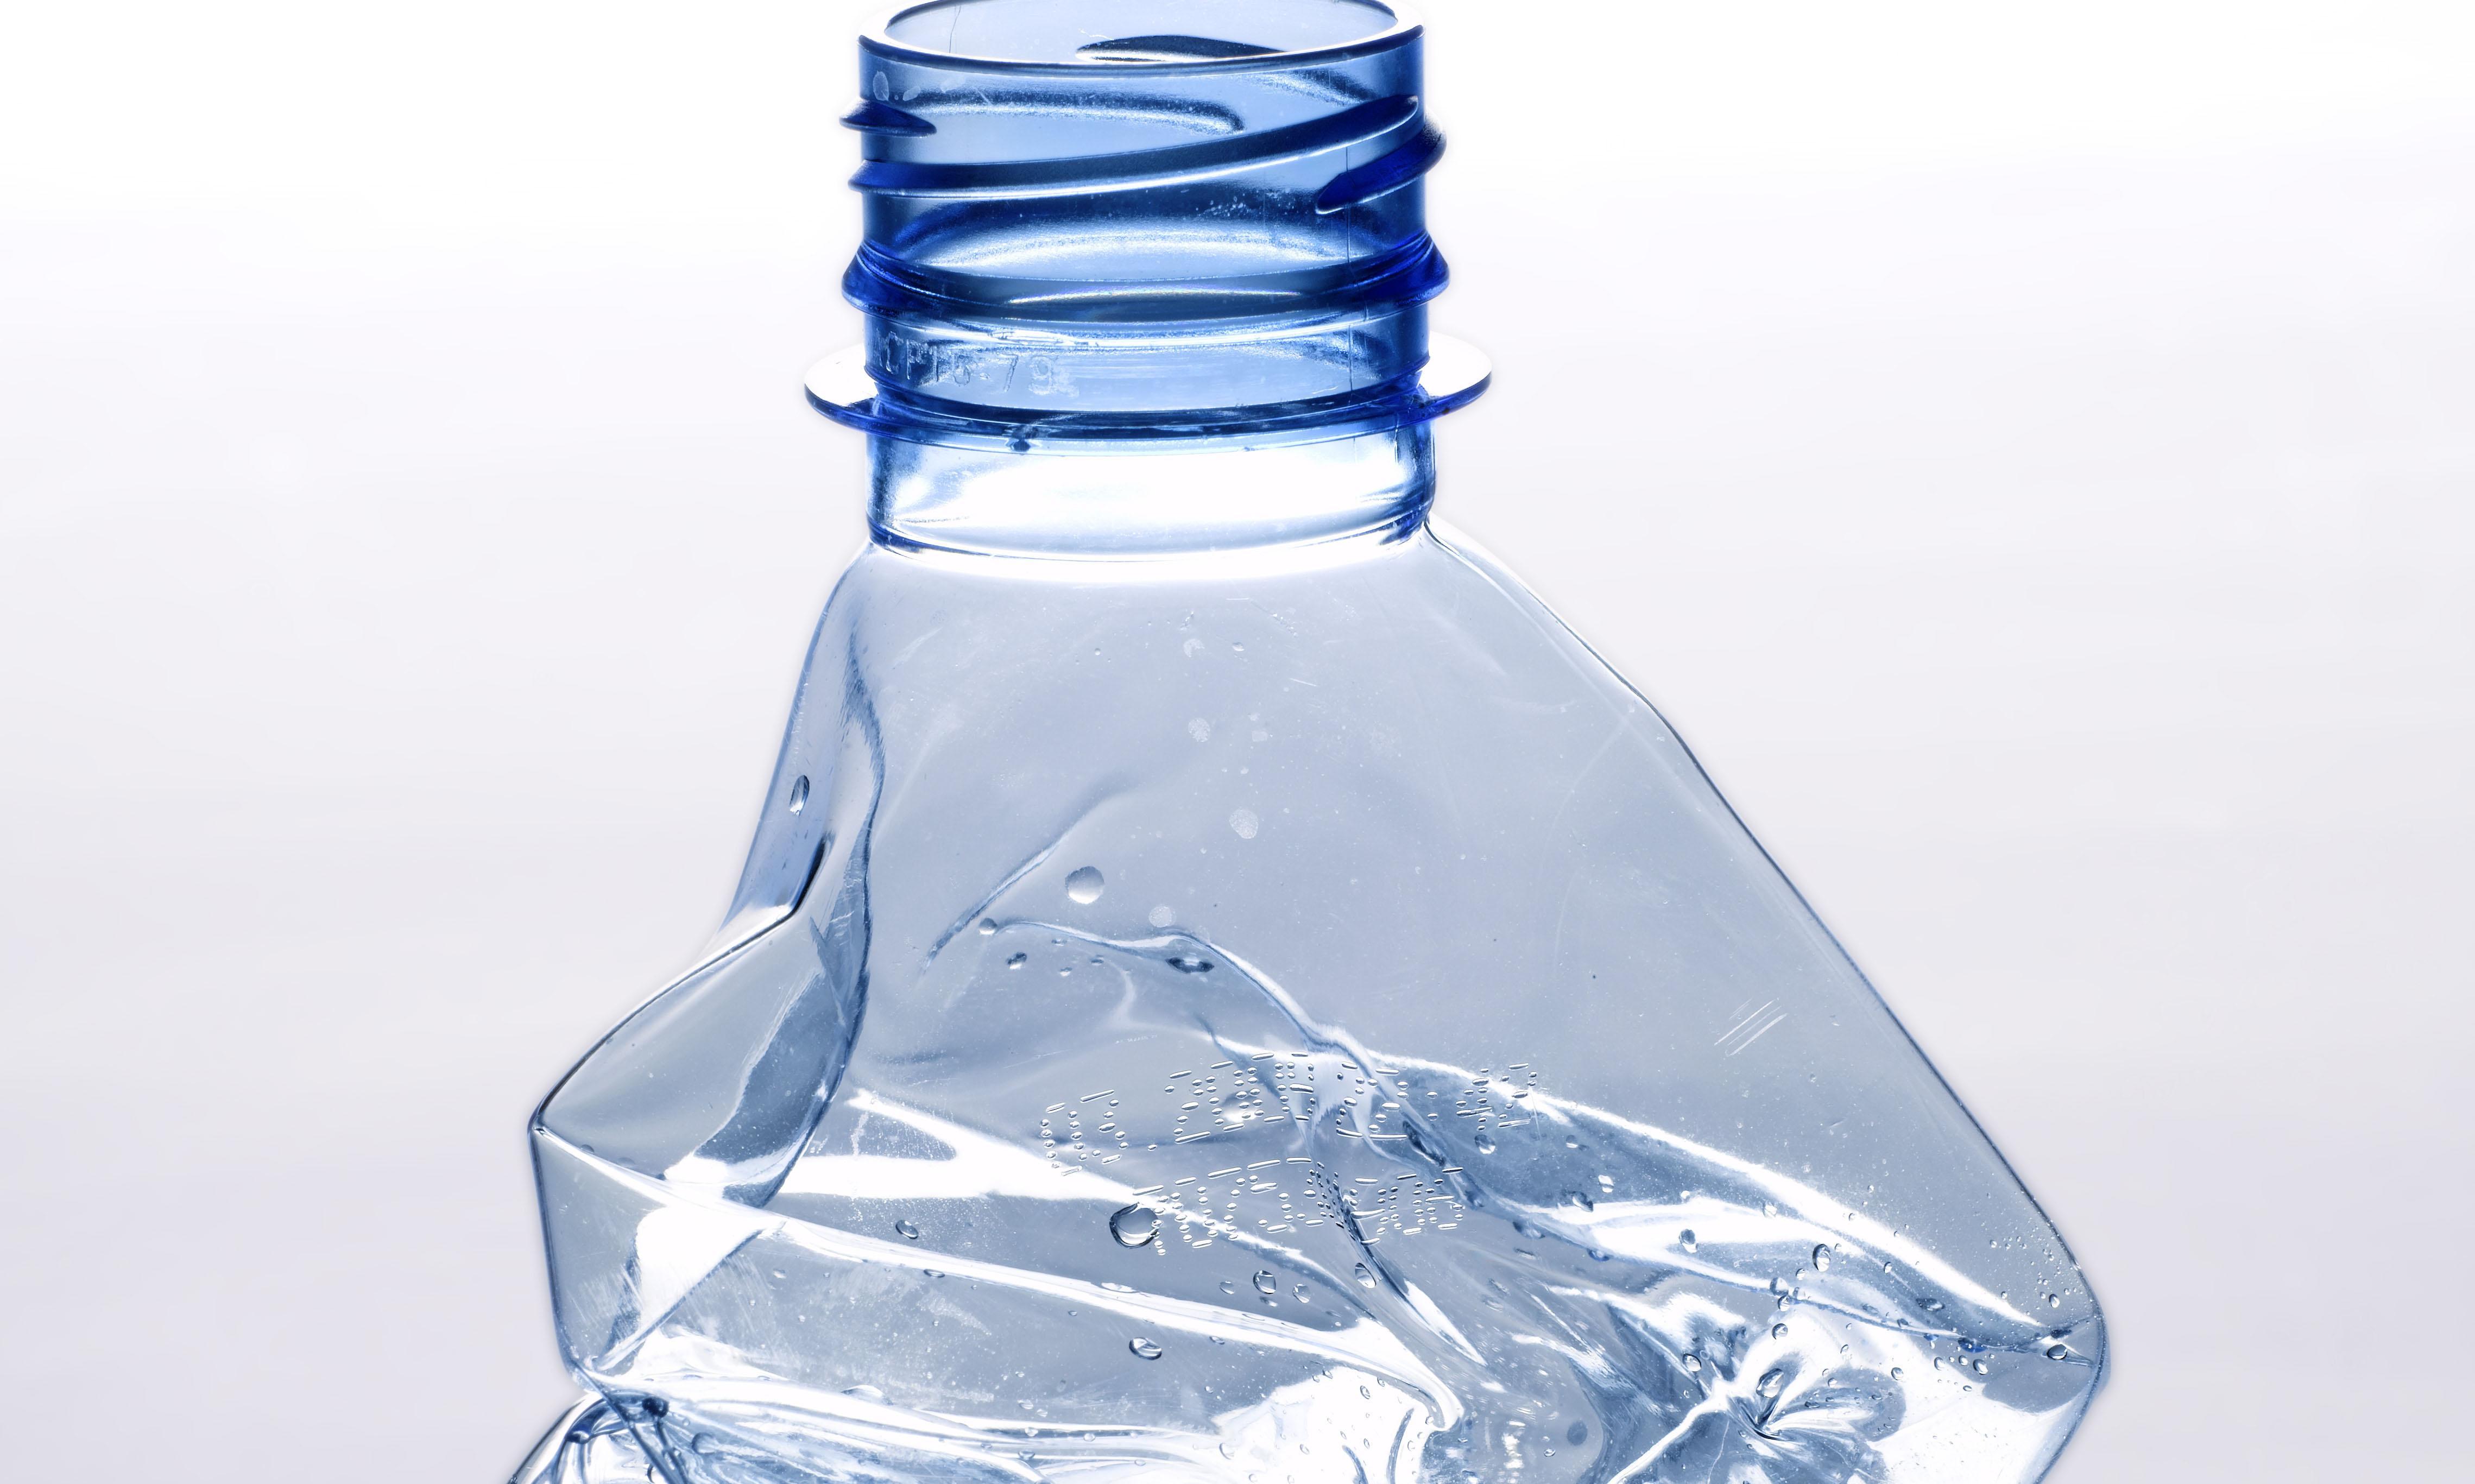 SodaStream's recycling incentive has left a nasty taste